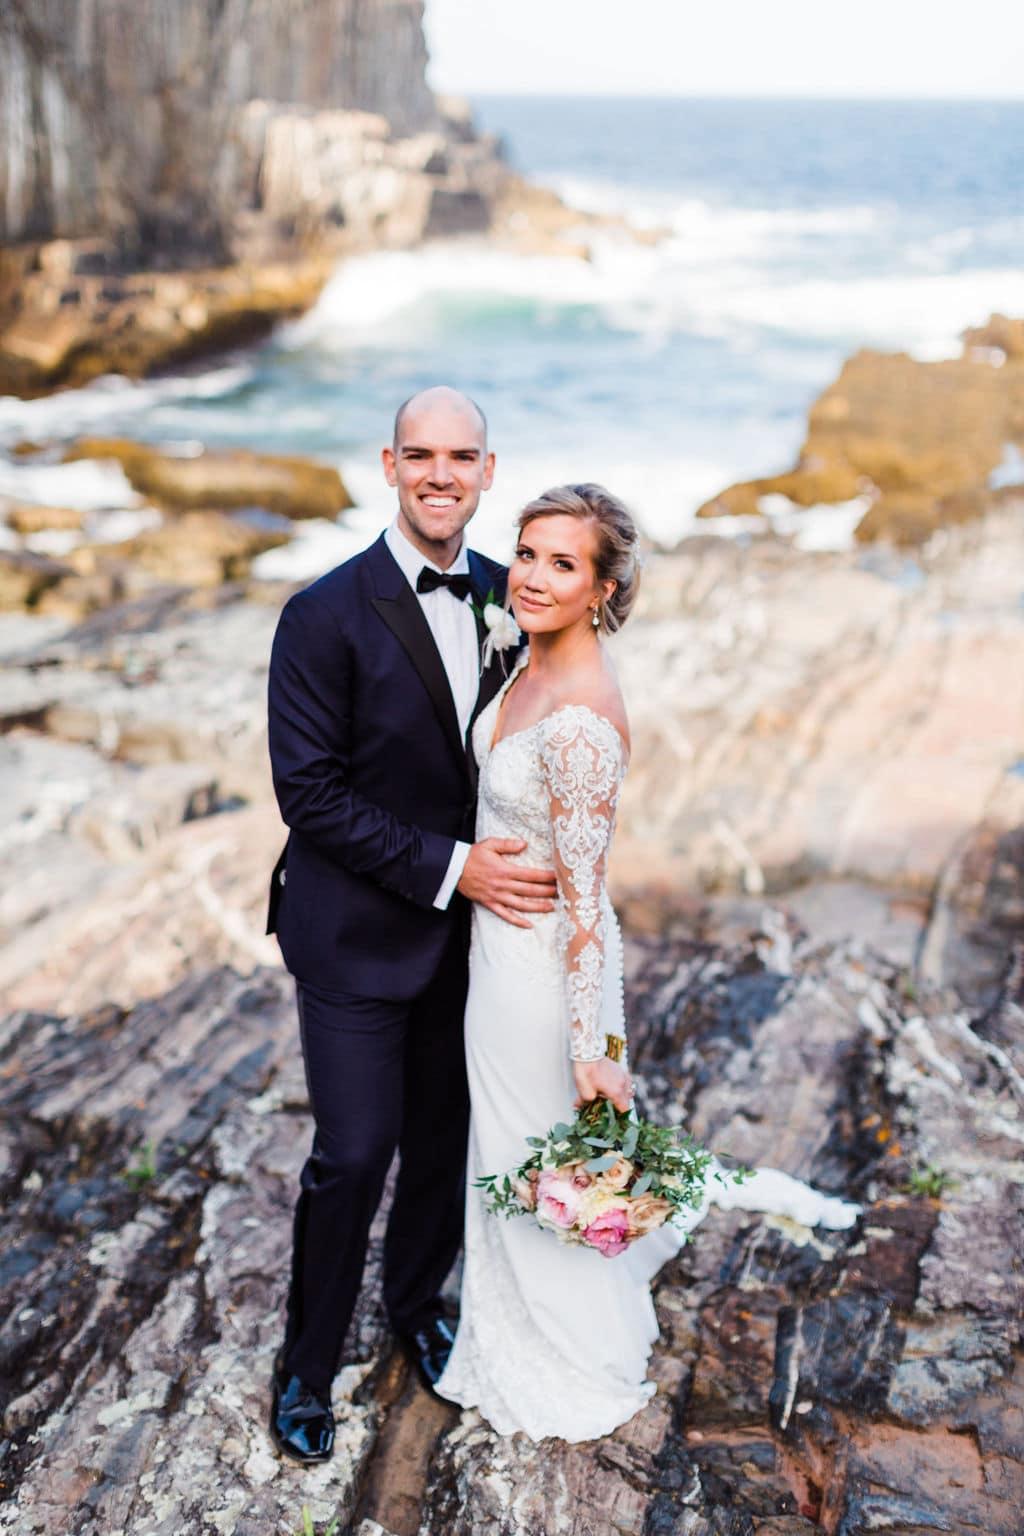 Wedding couple on the rocks after their coastal Maine wedding